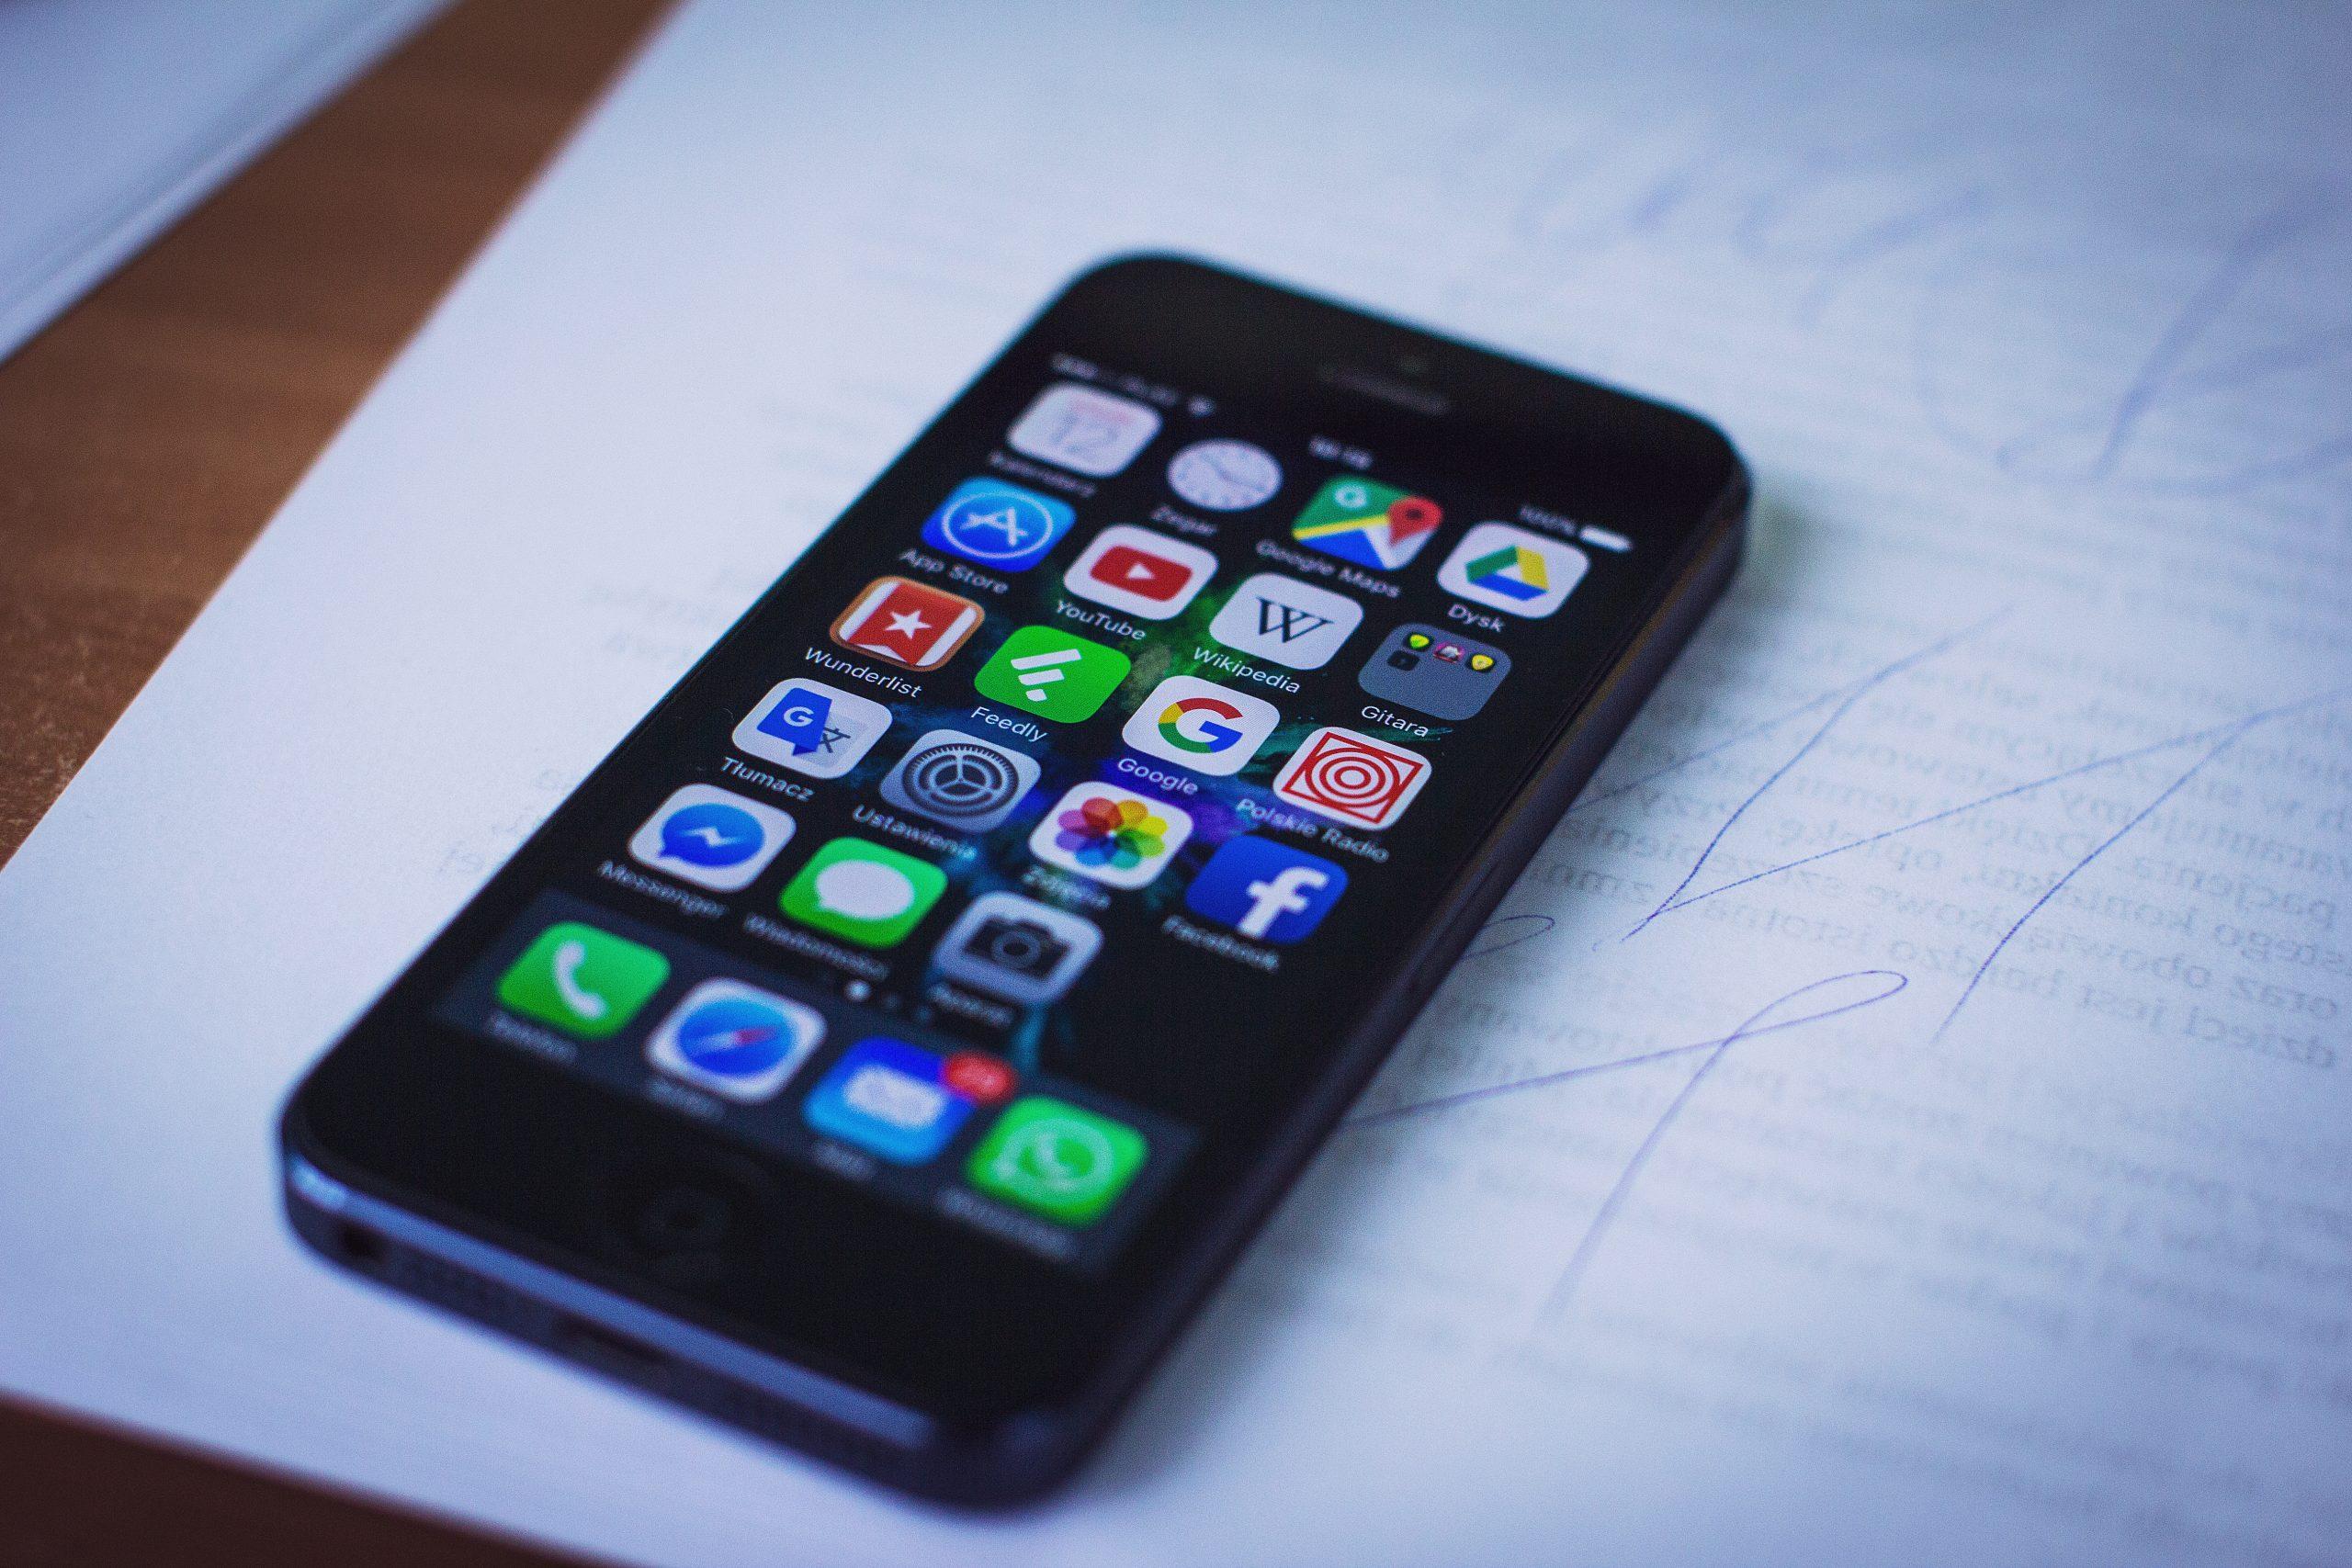 Smartphone image inclusive, sustainable development